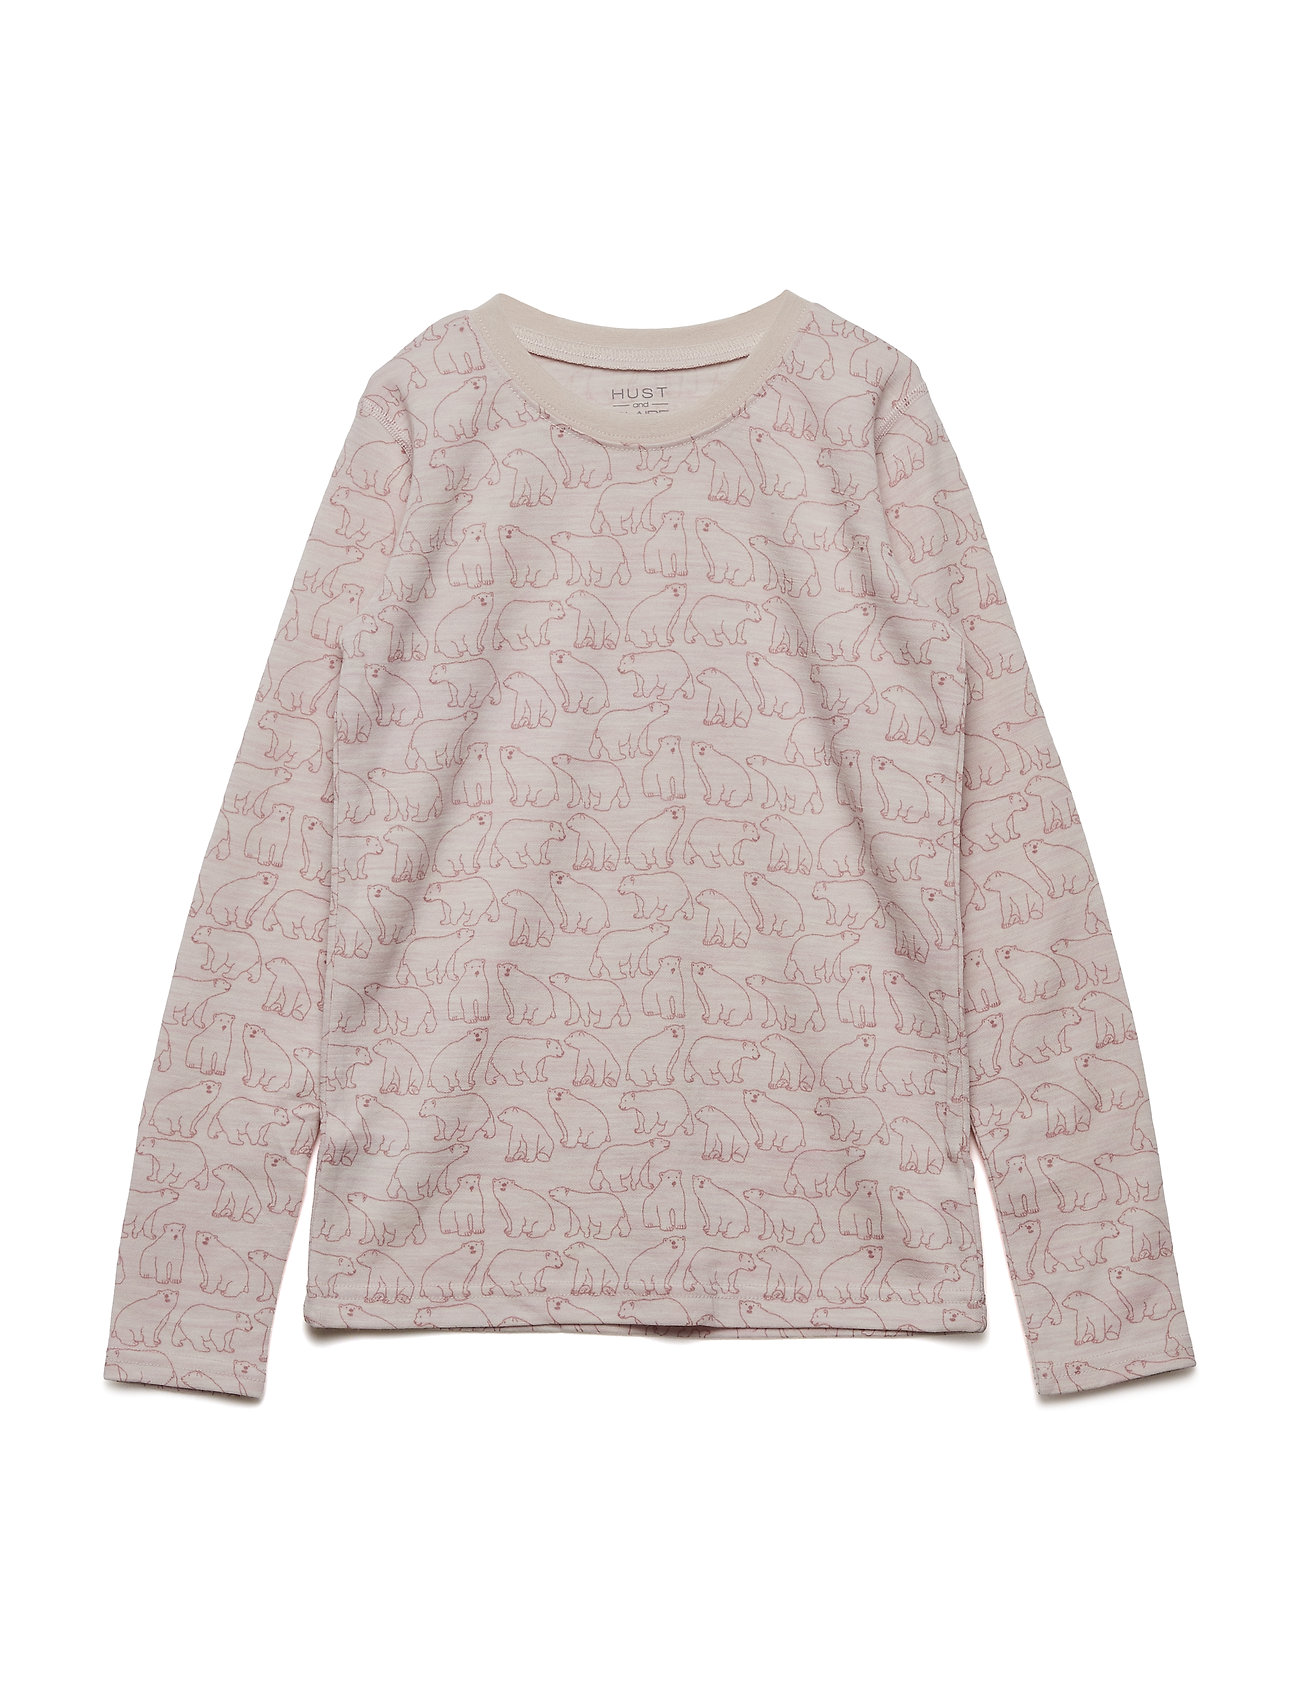 Hust & Claire Awo - Nightwear